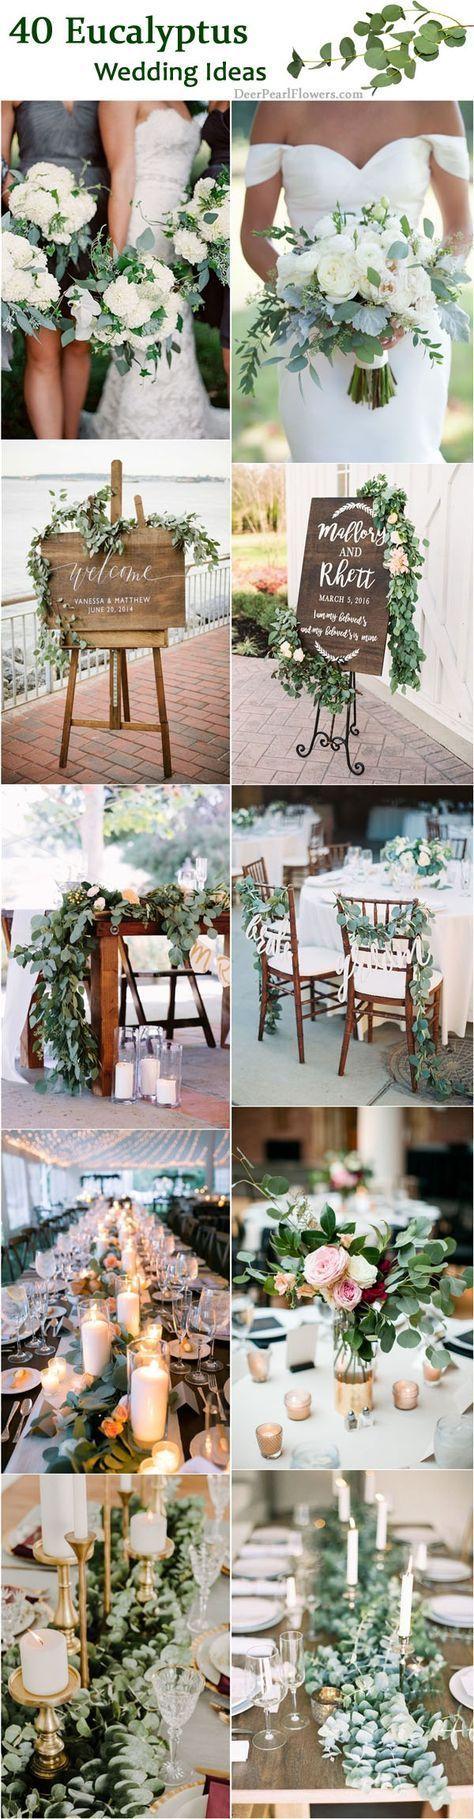 Wedding house decoration ideas   Greenery Eucalyptus Wedding Decor Ideas  Green weddings